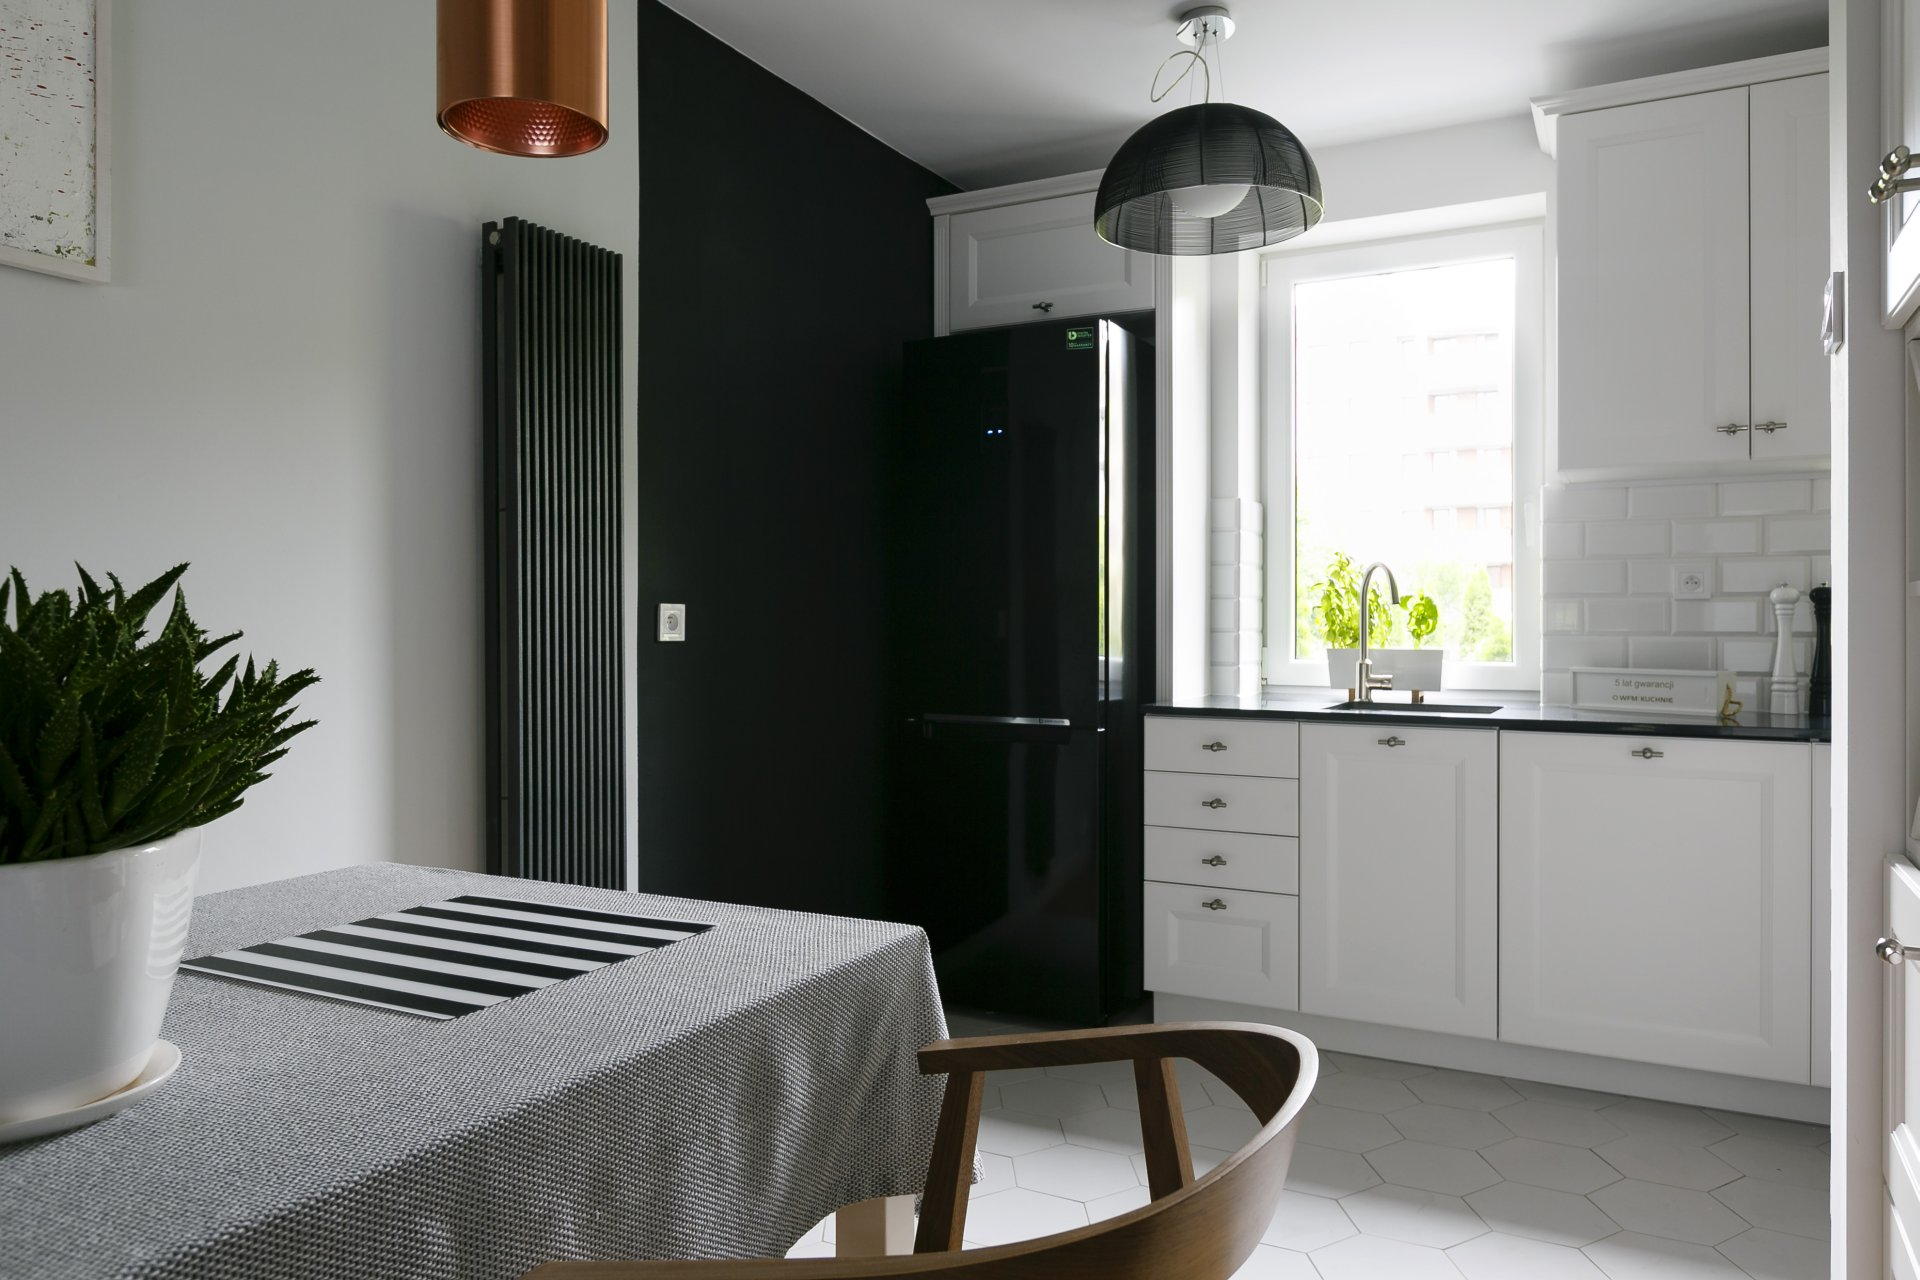 Kuchnia WFM Villa II M101 blat granit Negro Tebas Silestone - Kuchnie na wymiar Kraków, meble kuchenne Kraków | WFM Kuchnie Kraków